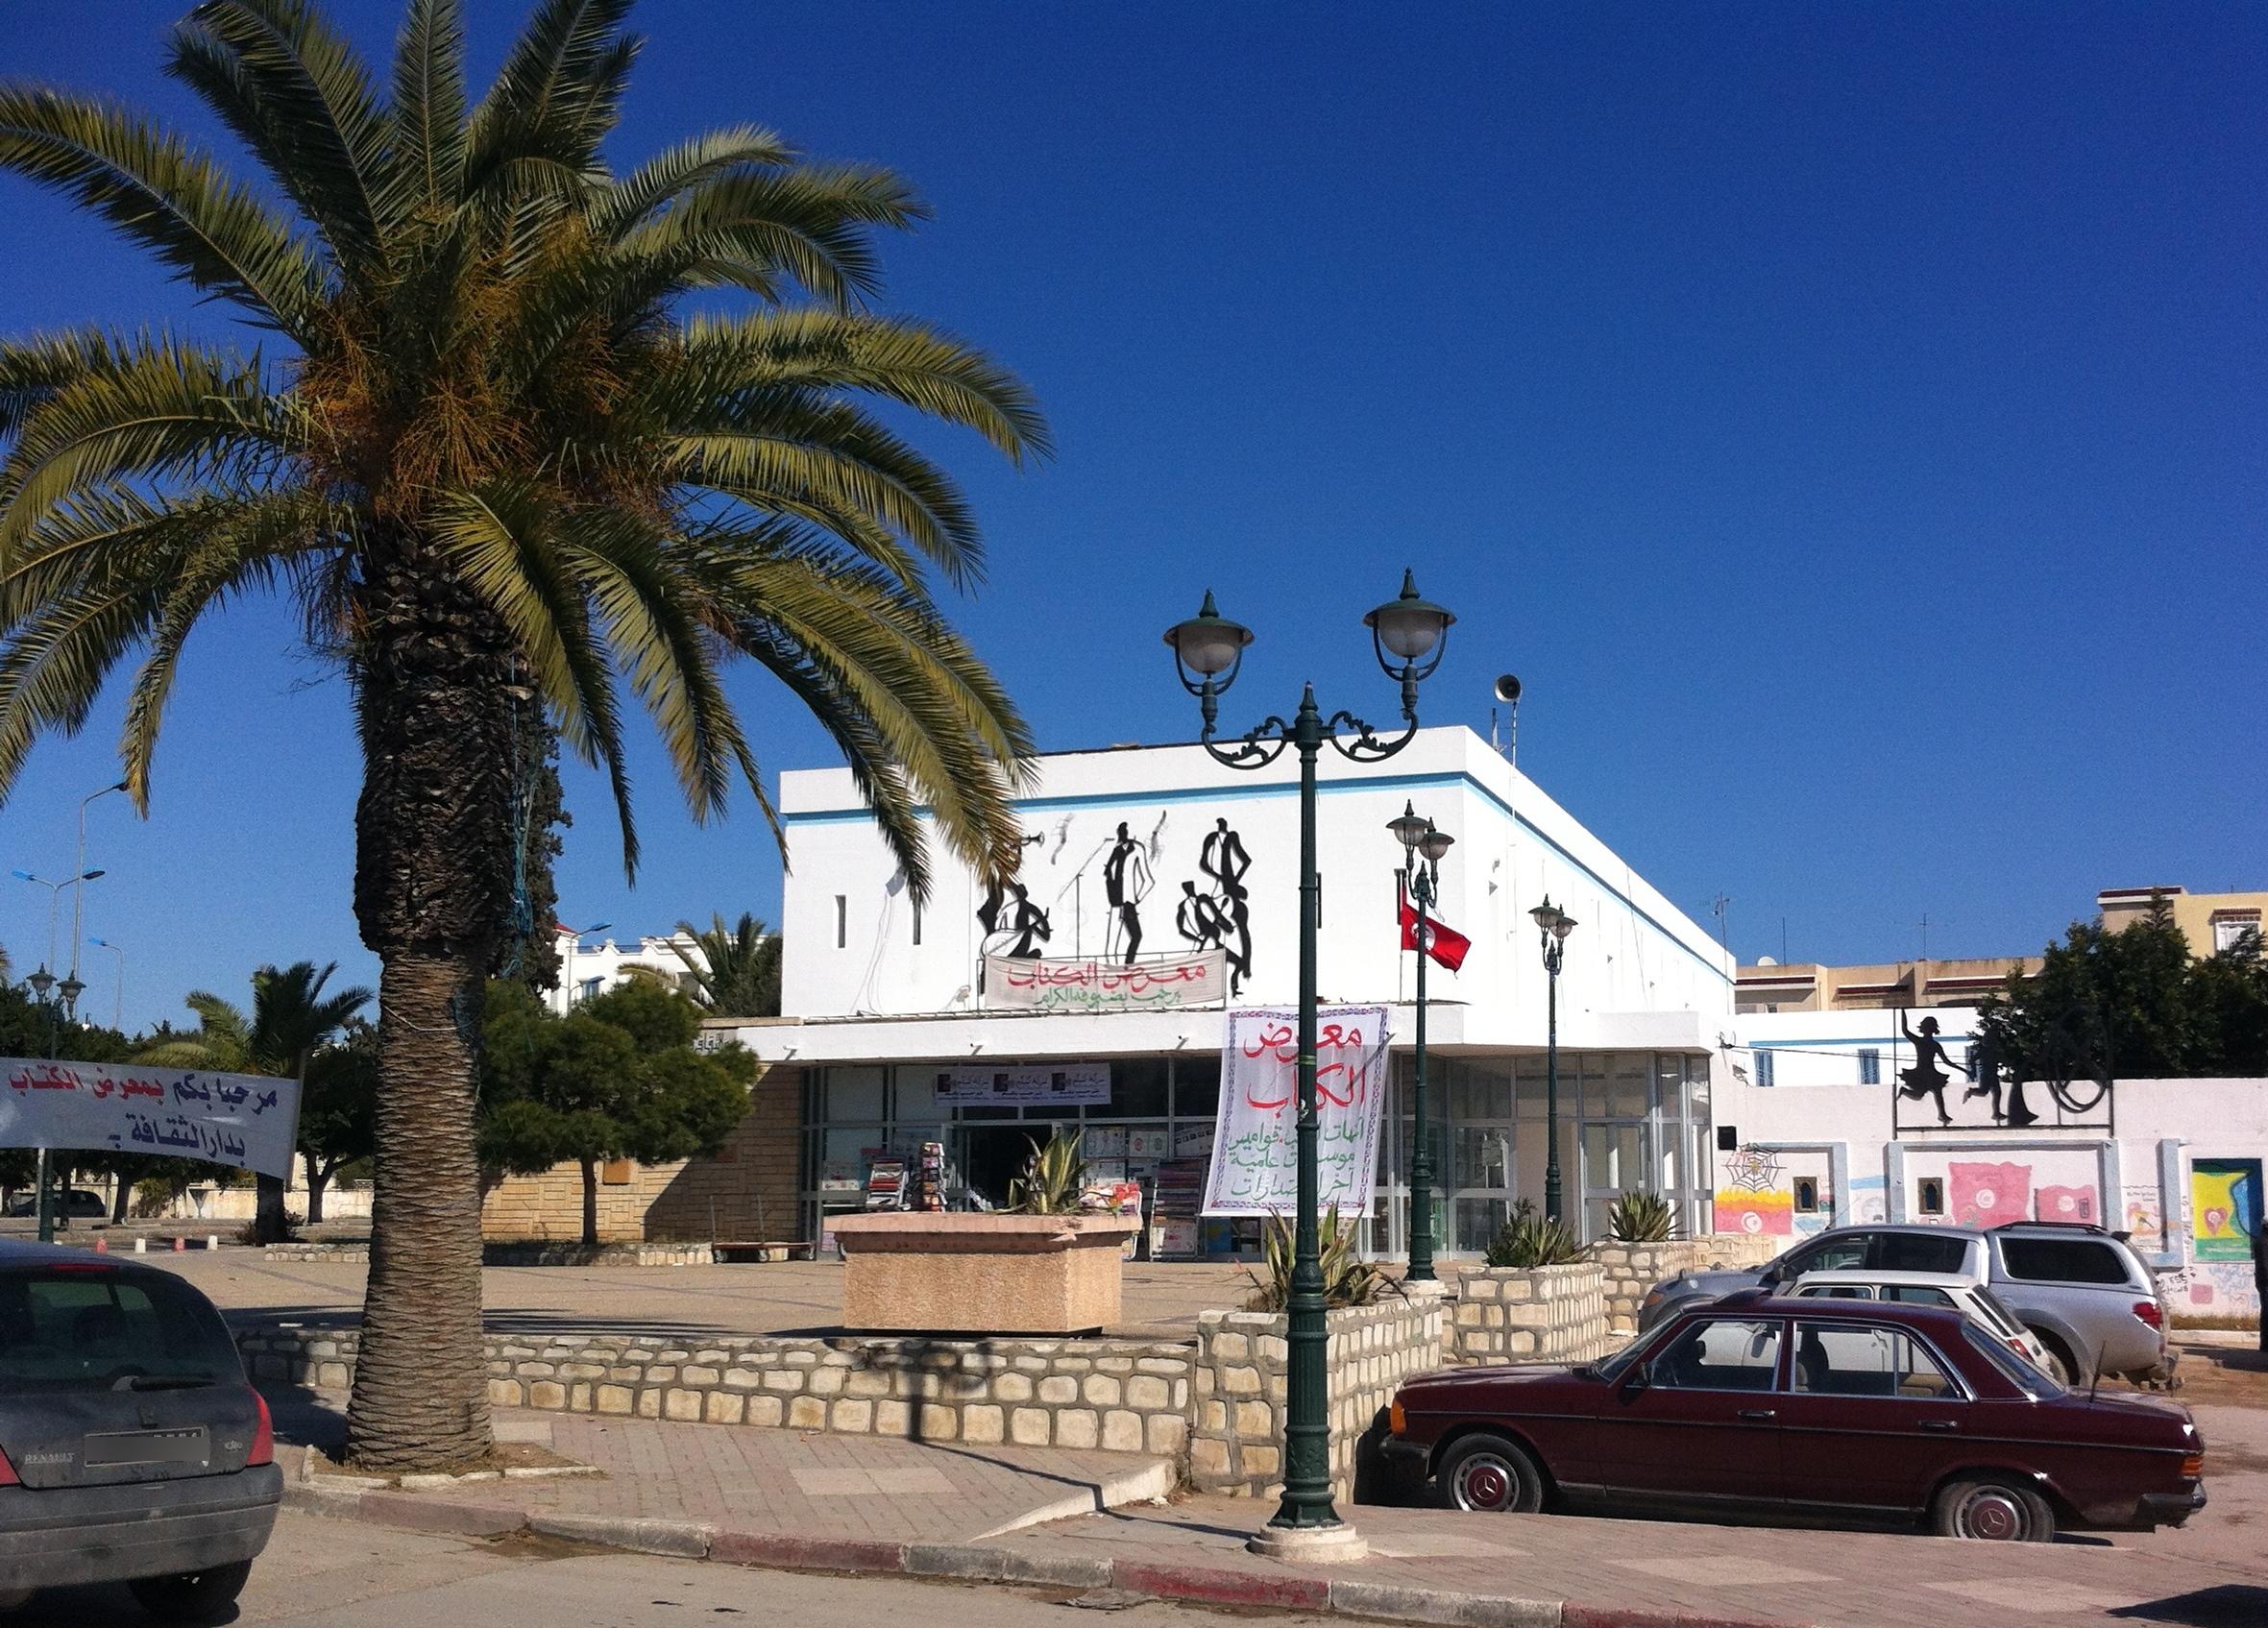 file maison de la culture msaken tunisie 2012 jpg wikimedia commons. Black Bedroom Furniture Sets. Home Design Ideas